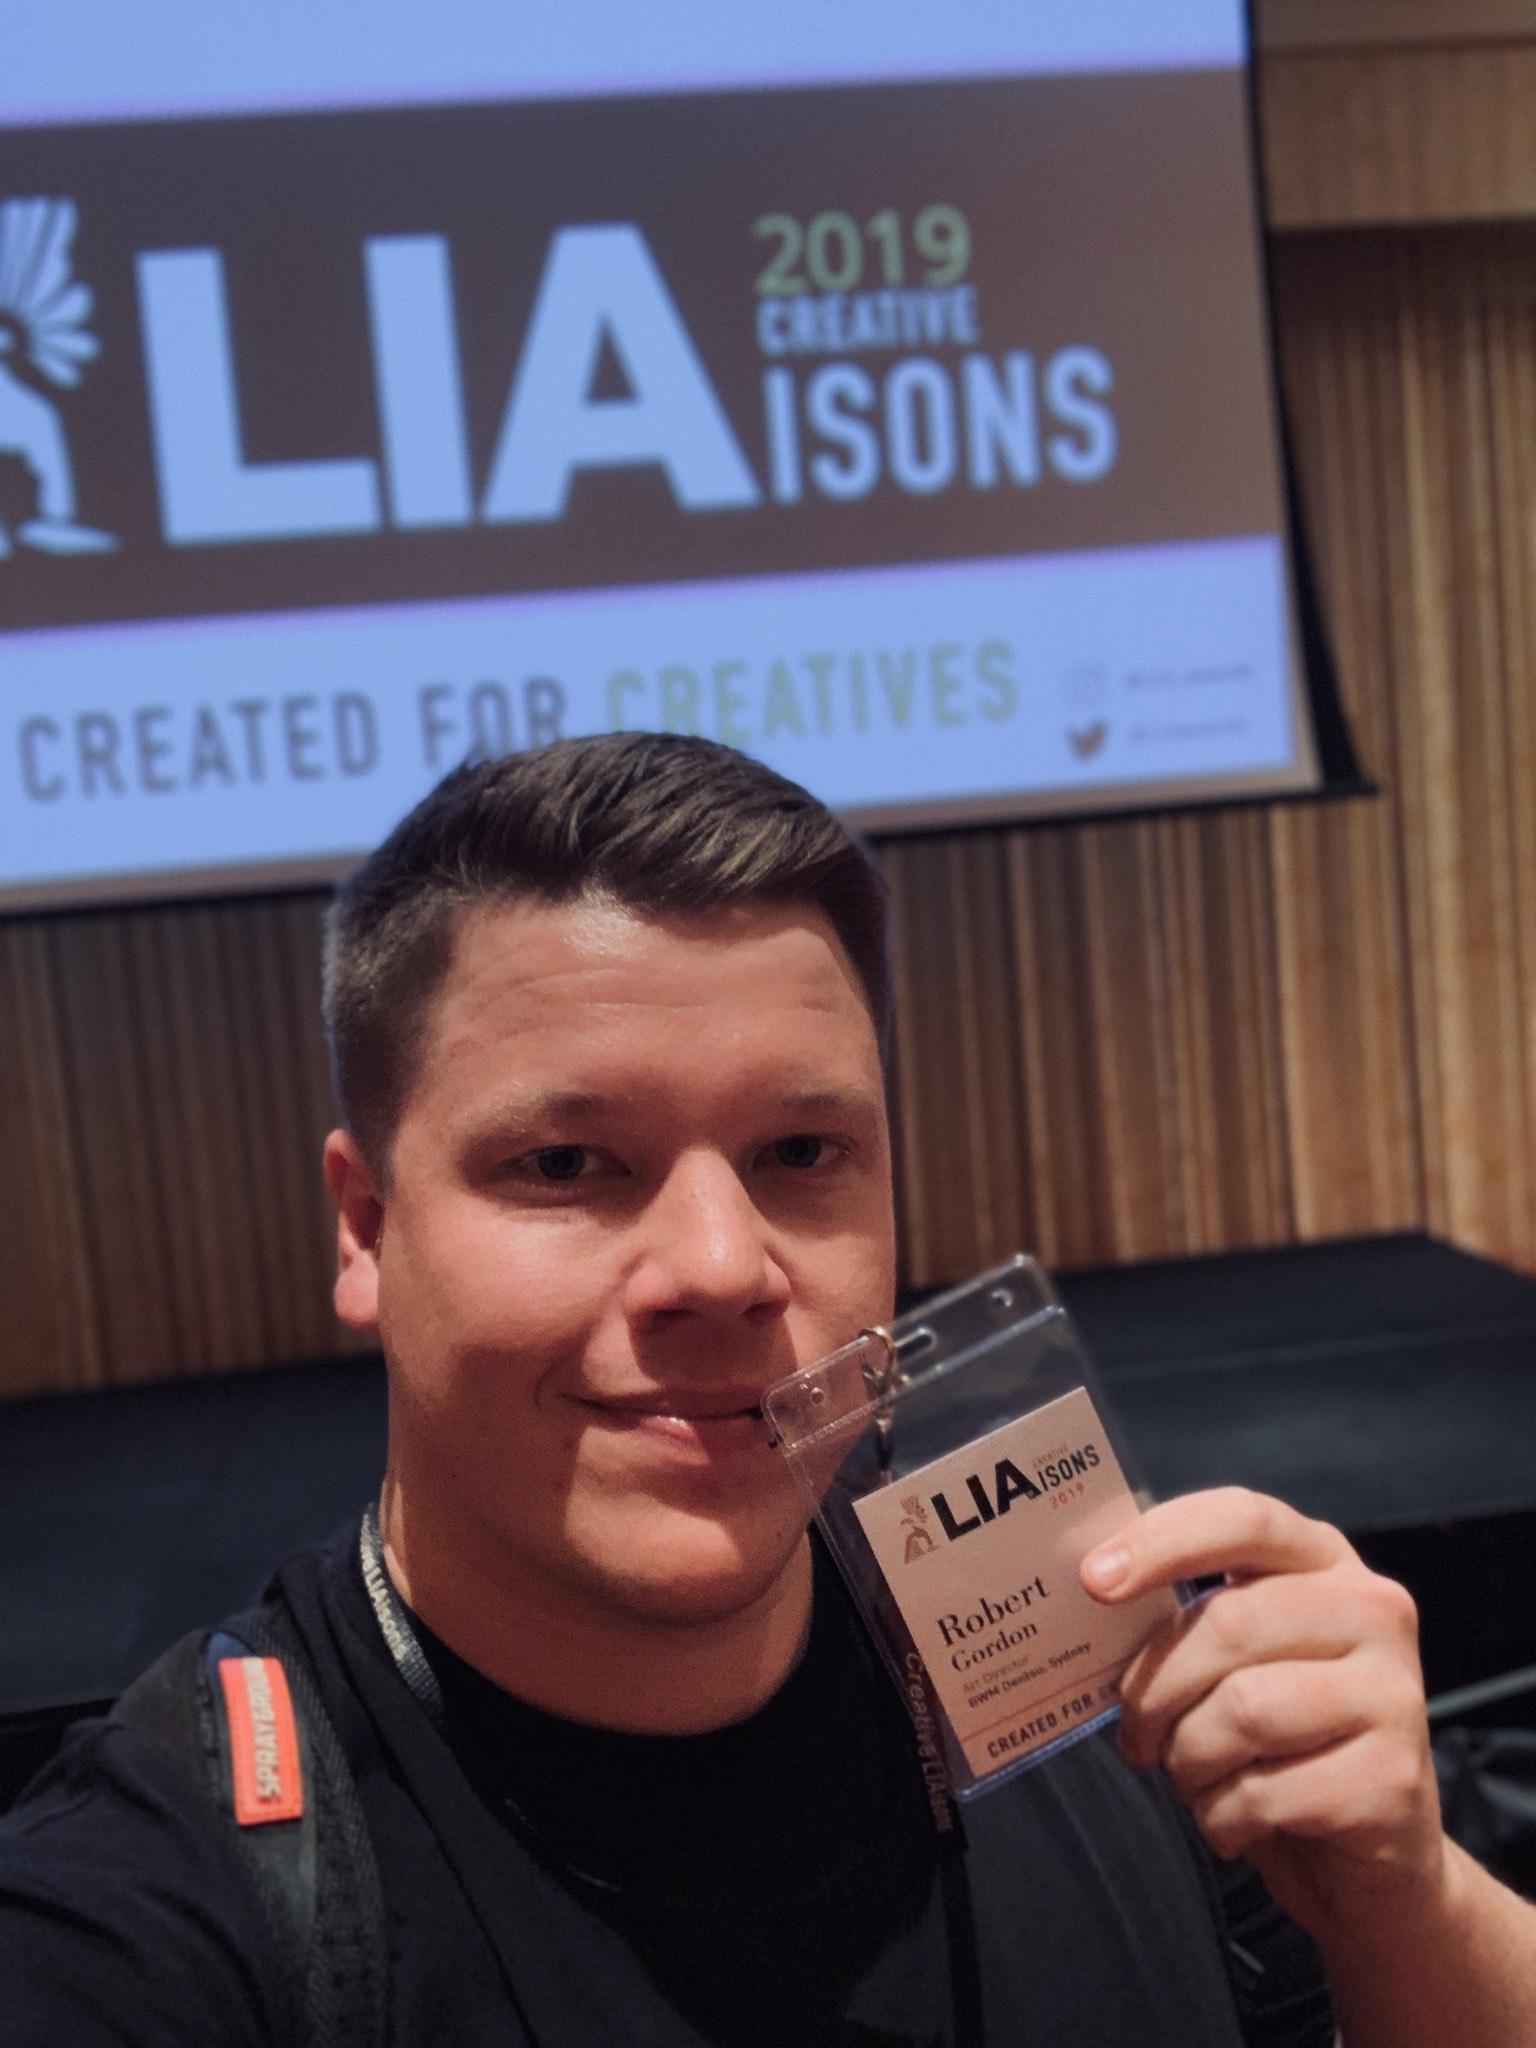 Rob Gordon's Creative LIAisons Diary